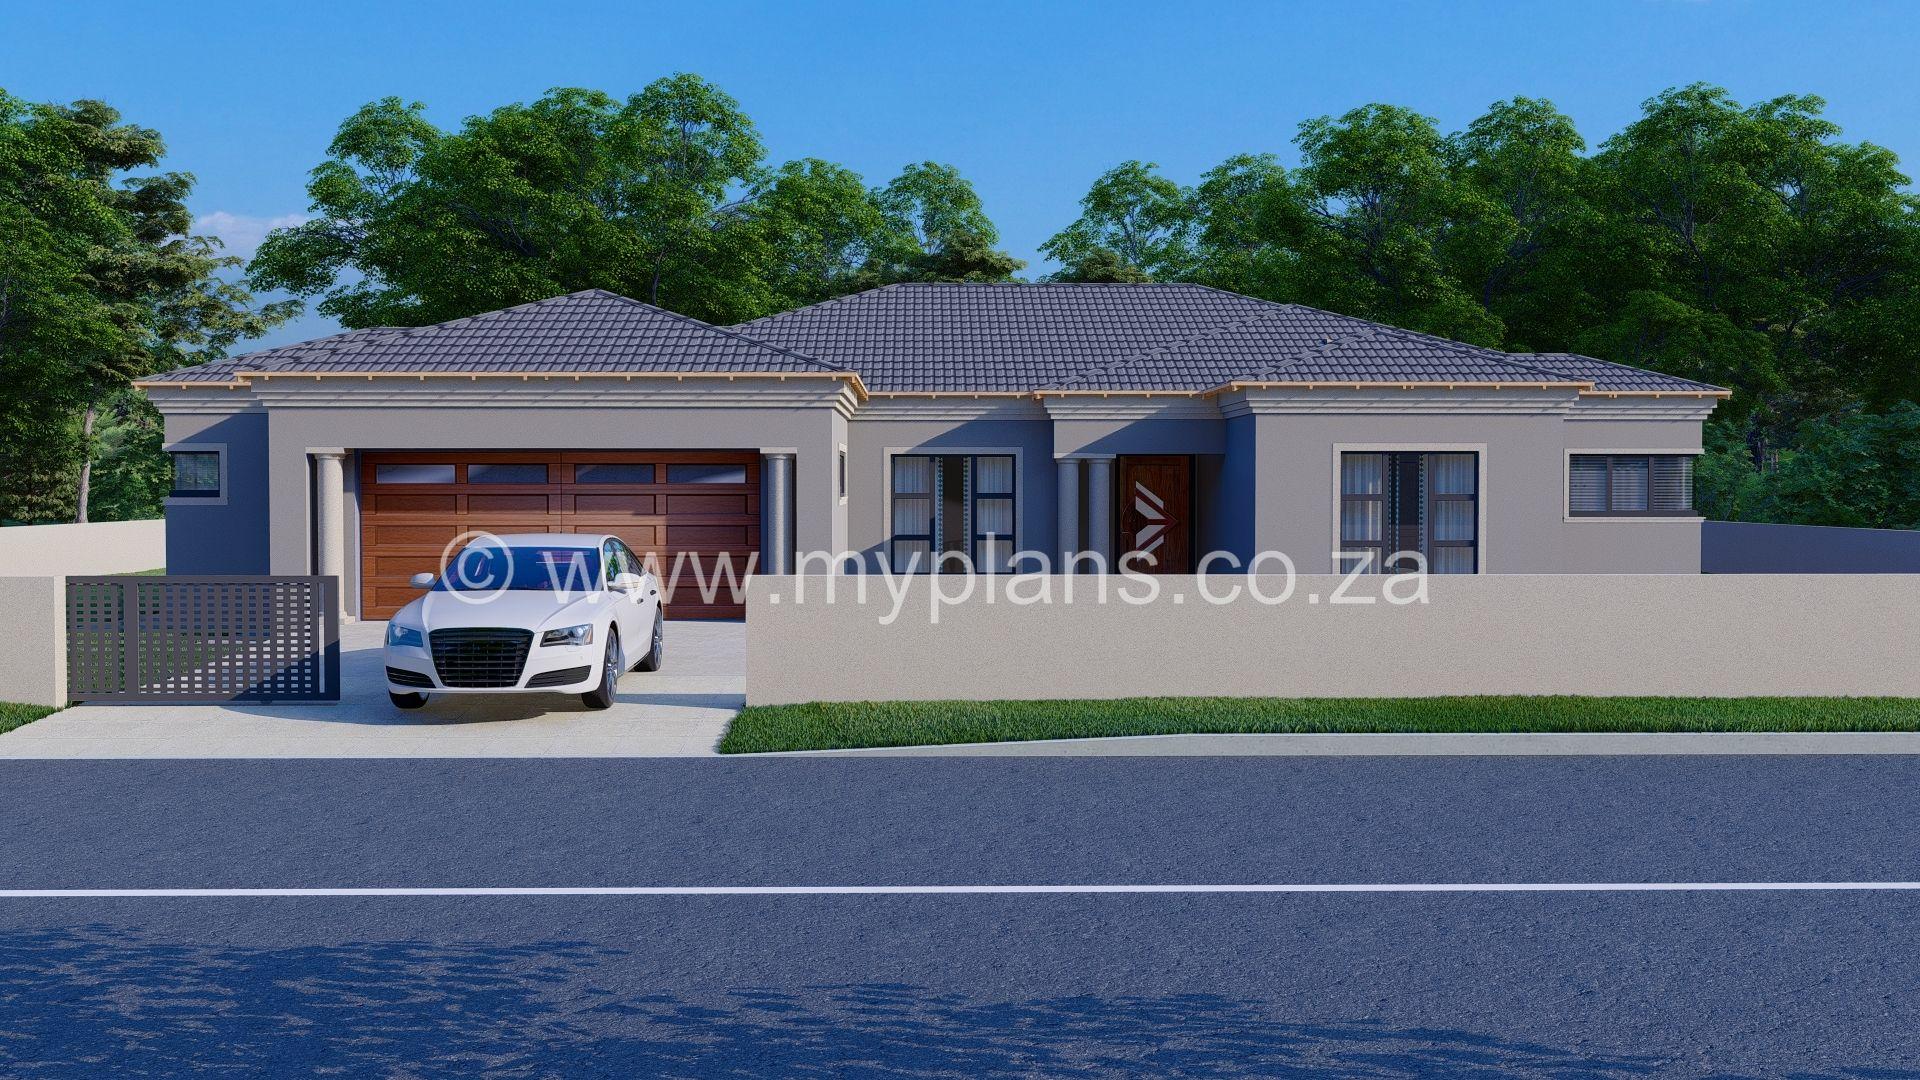 3 Bedroom House Plan Mlb 069s Bedroom House Plans My House Plans House Plans South Africa